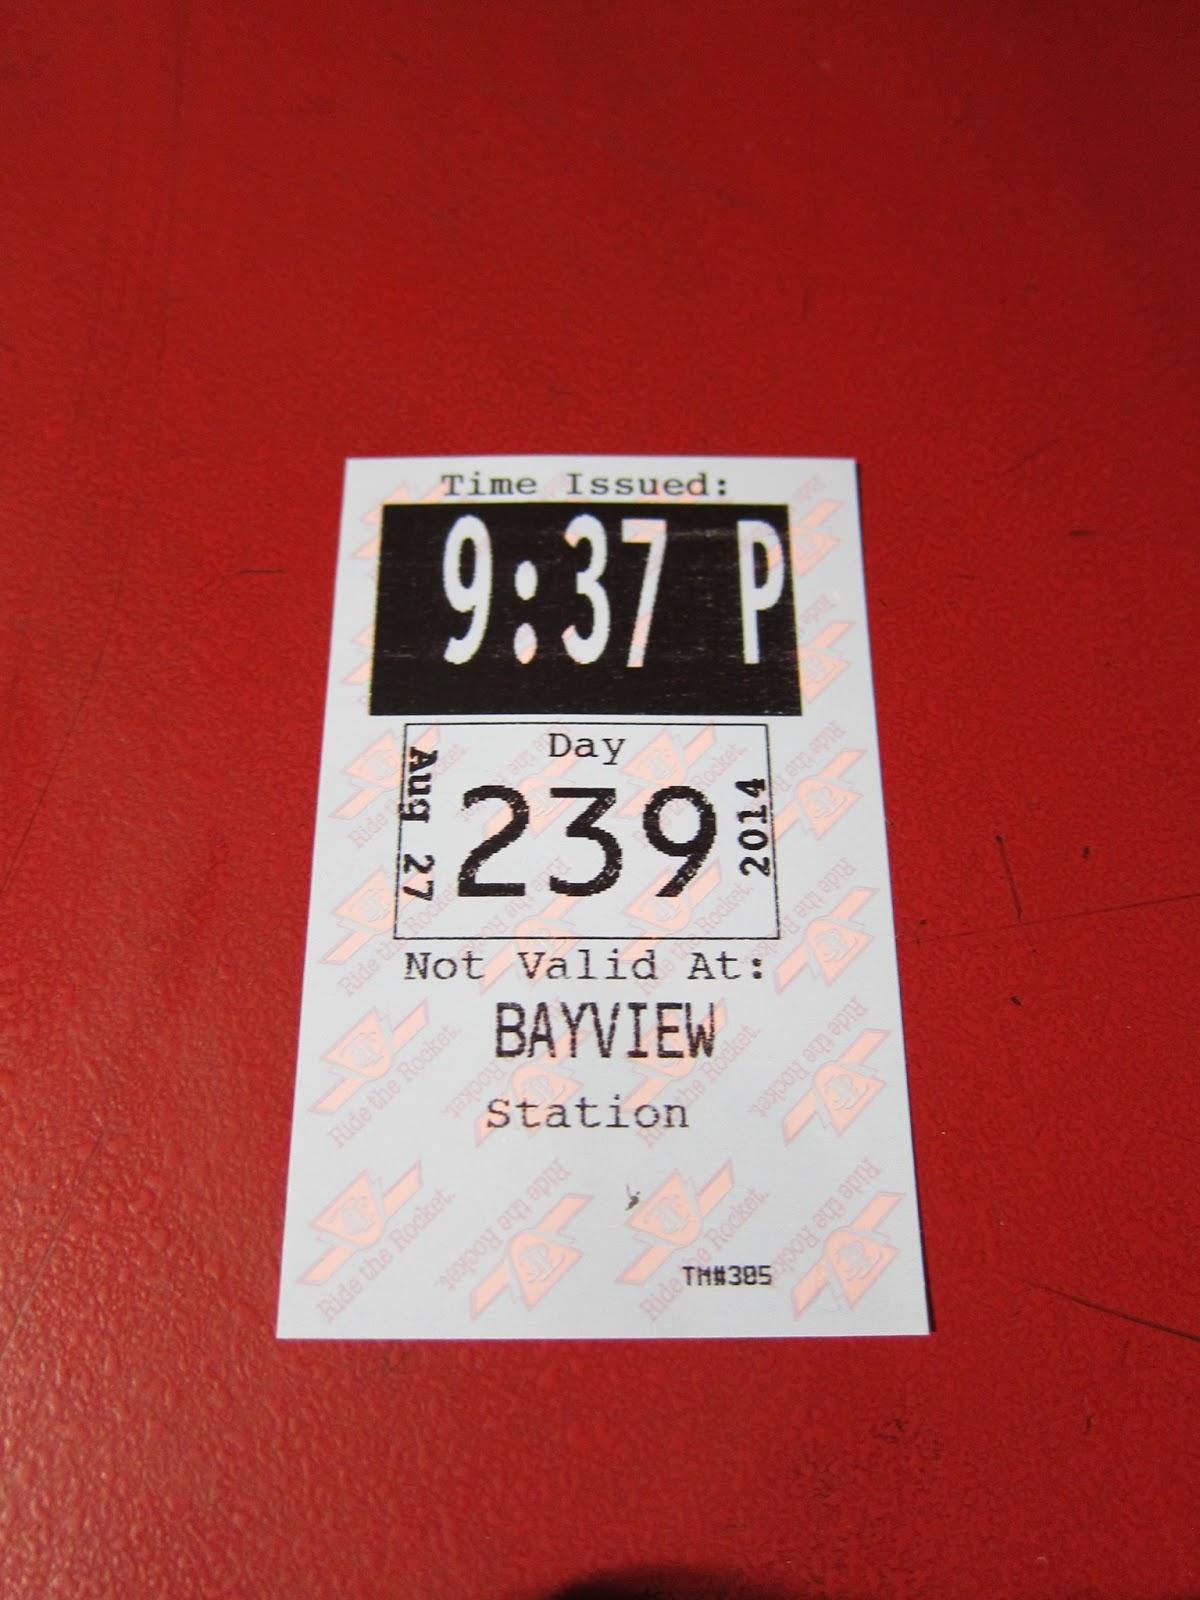 Bayview Station transfer